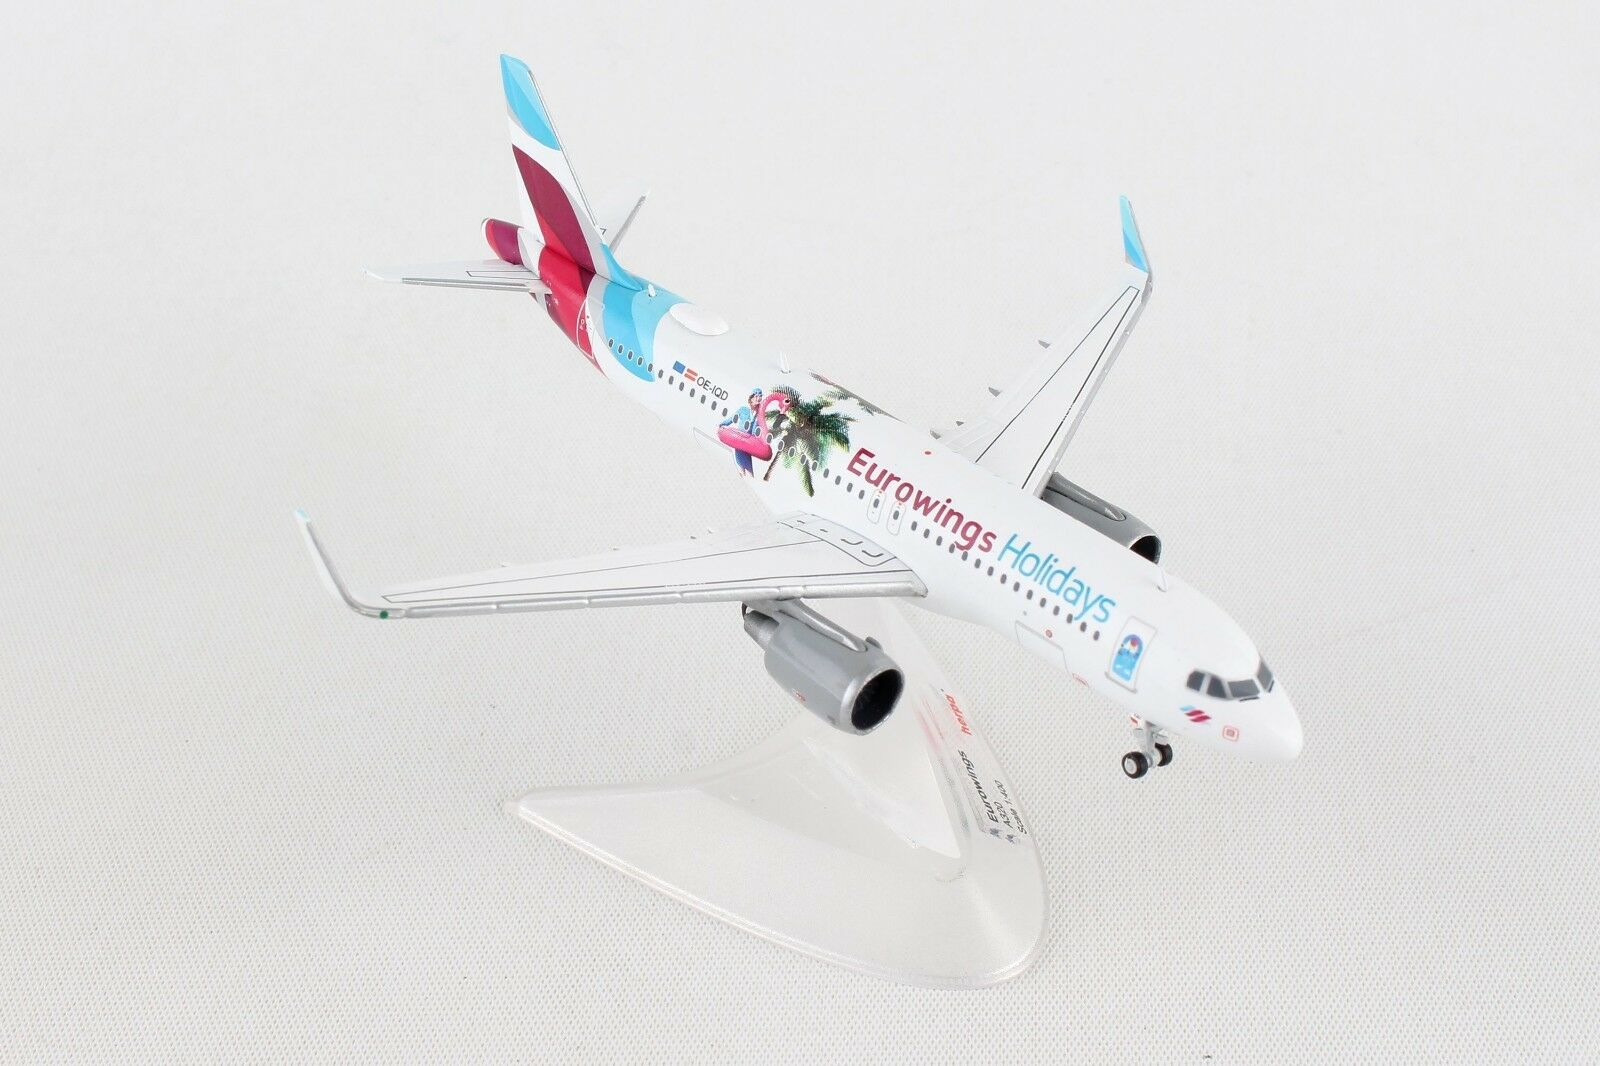 producto de calidad HE562669 Herpa Herpa Herpa Wings Eurowings Airbus A320 1 400 Die-cast modelo de avión  marca de lujo